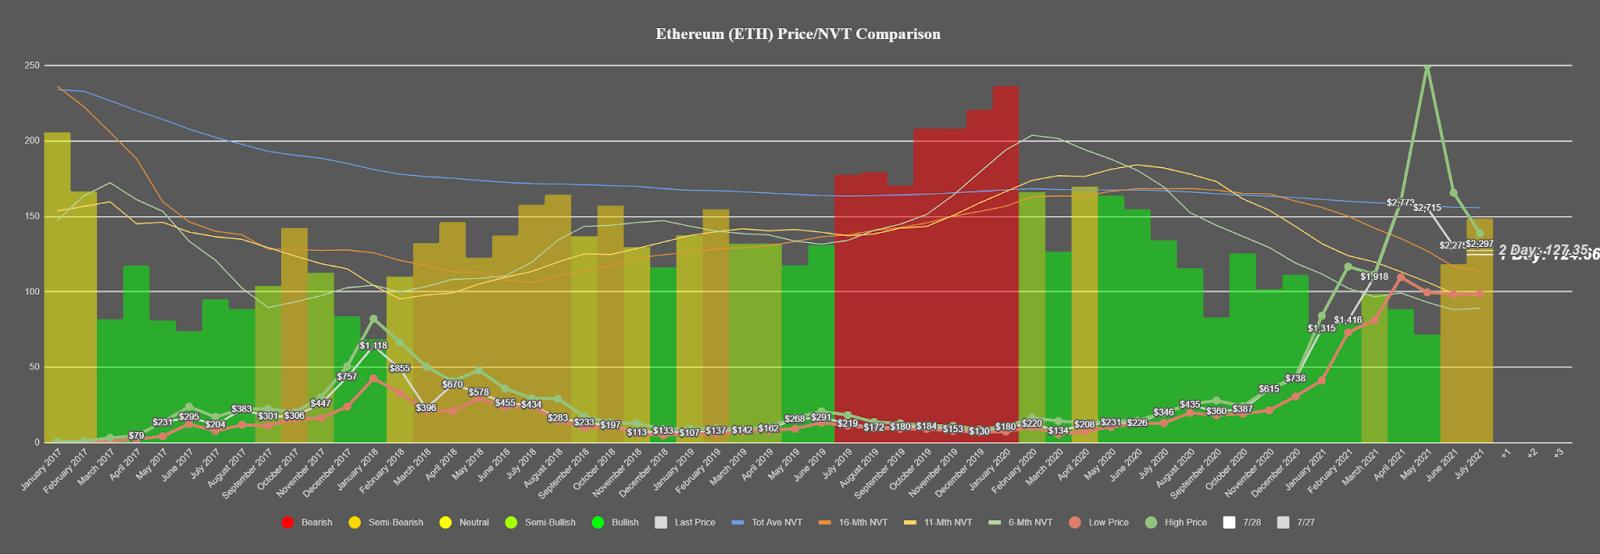 Santiment报告:比特币各项指标飙升,牛市或将开始第二周期?